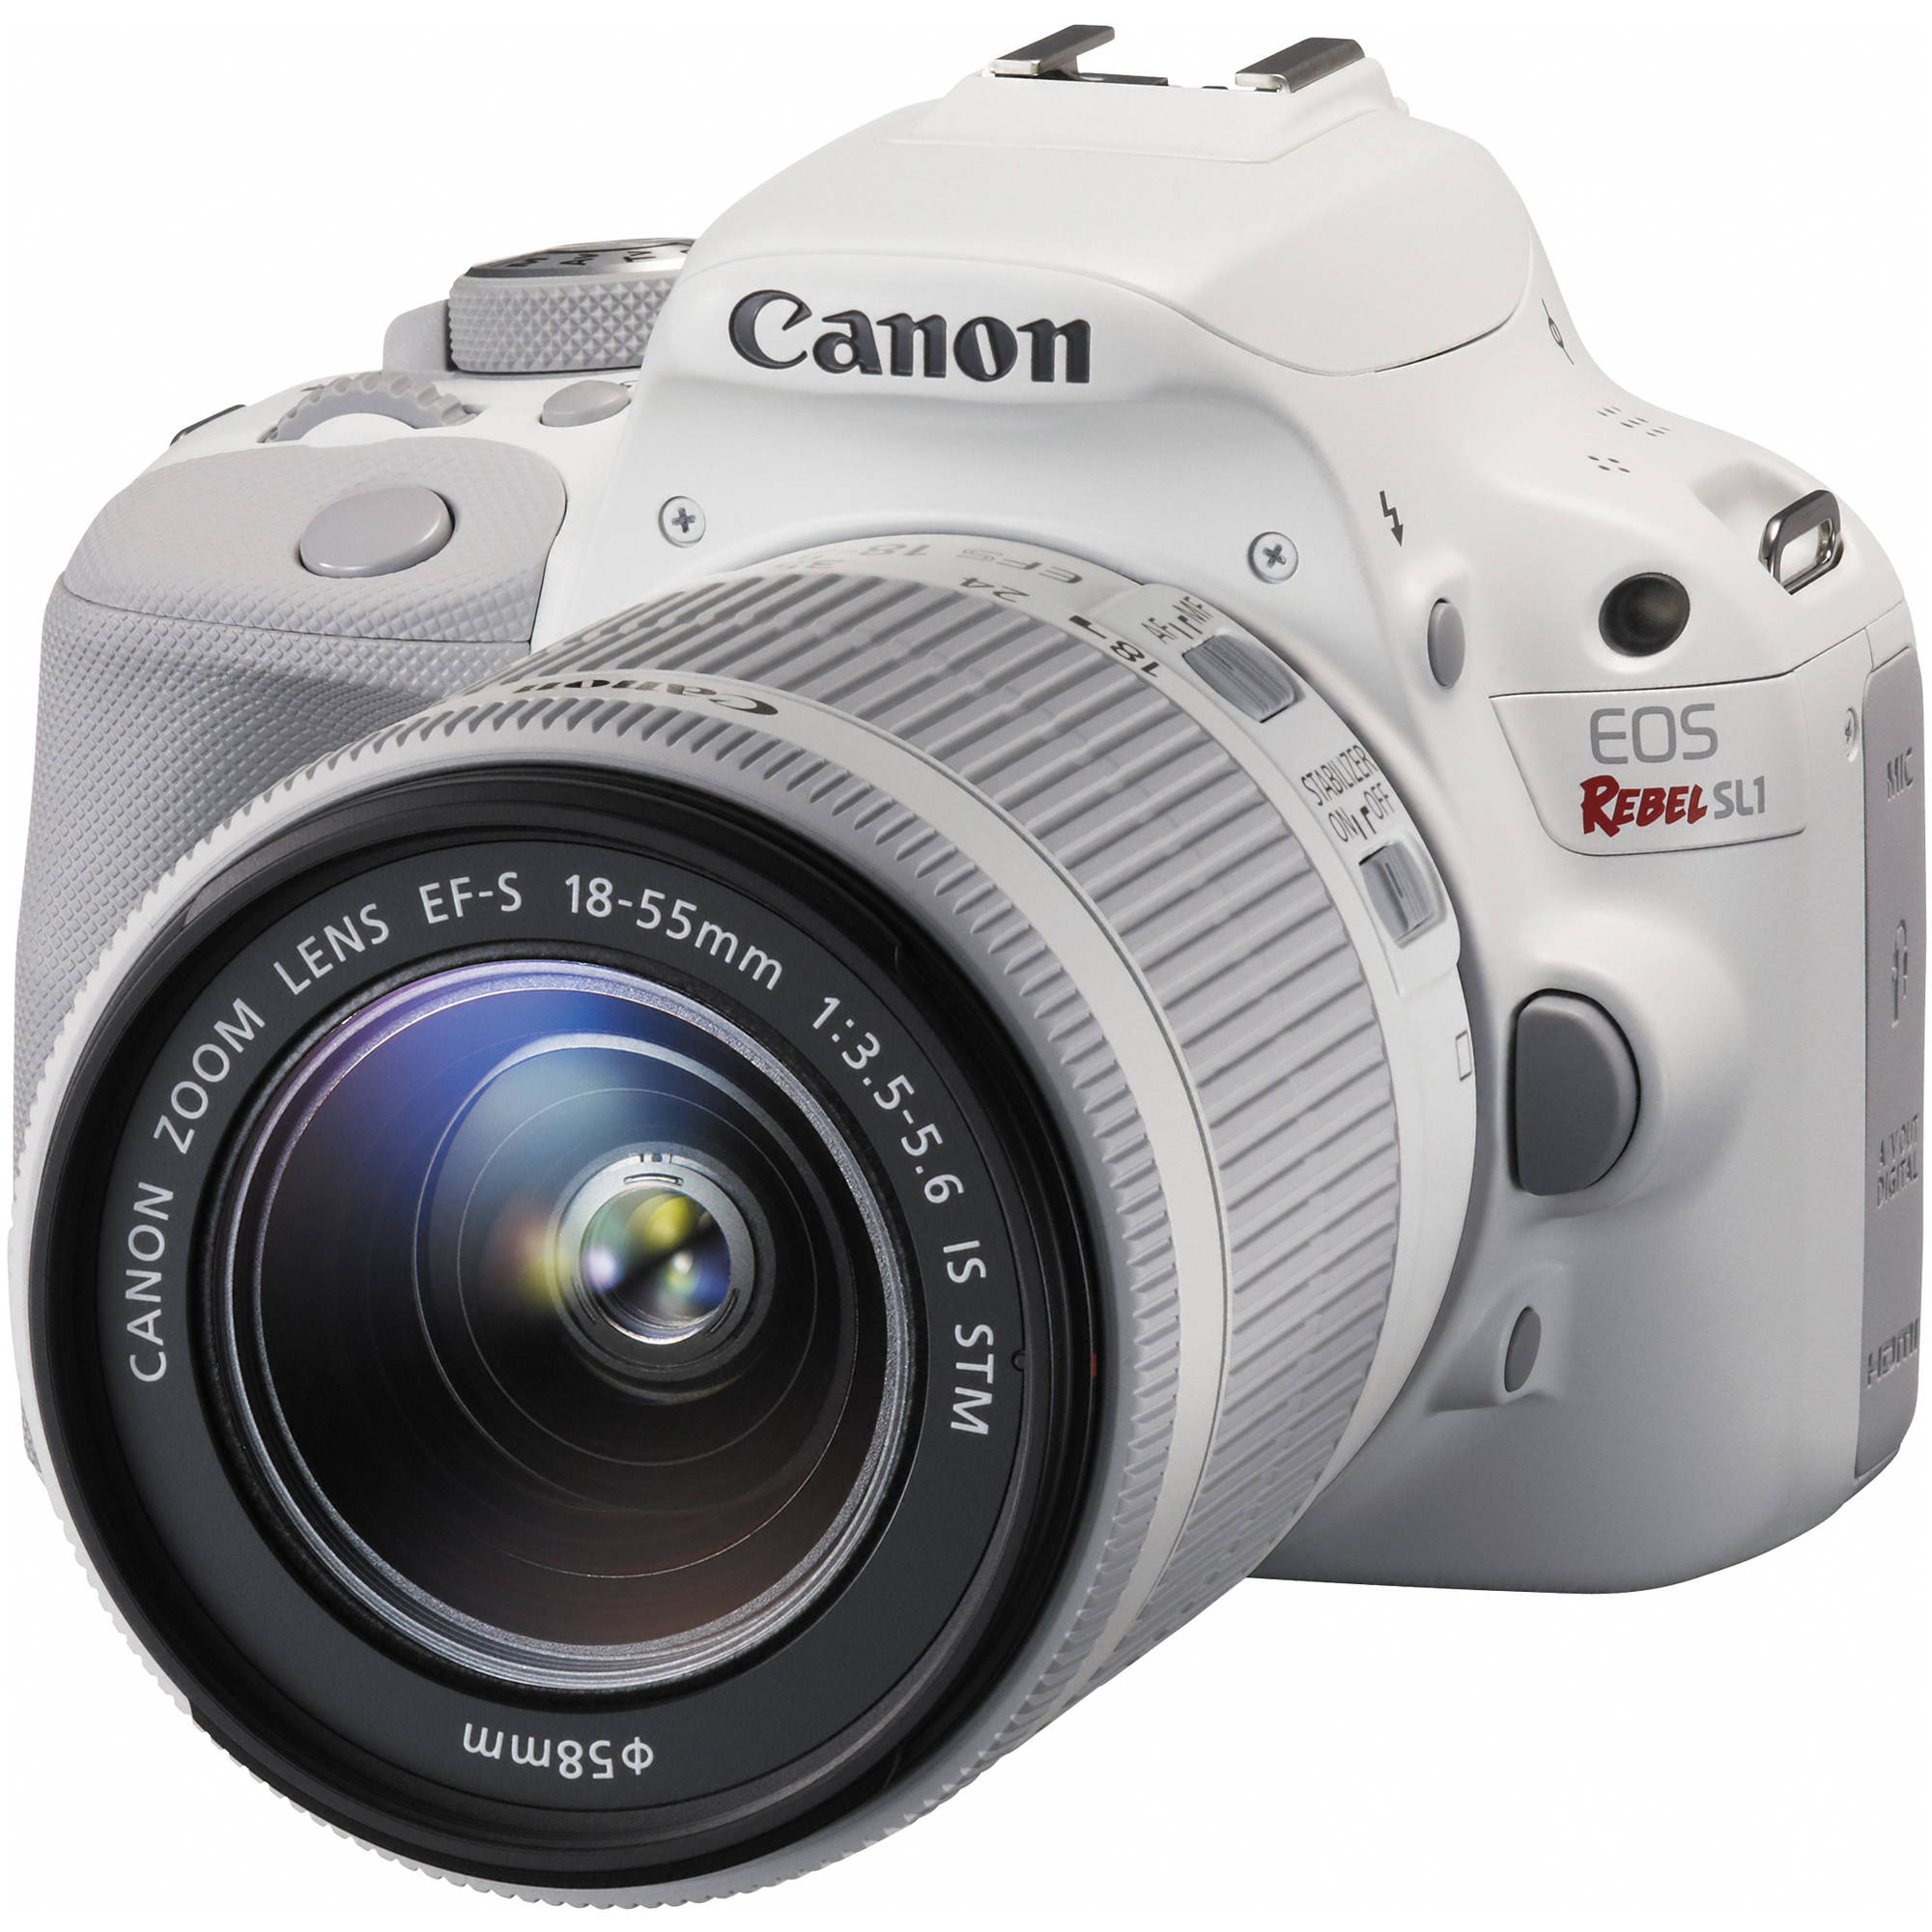 зеркальный фотоаппарат canon цена